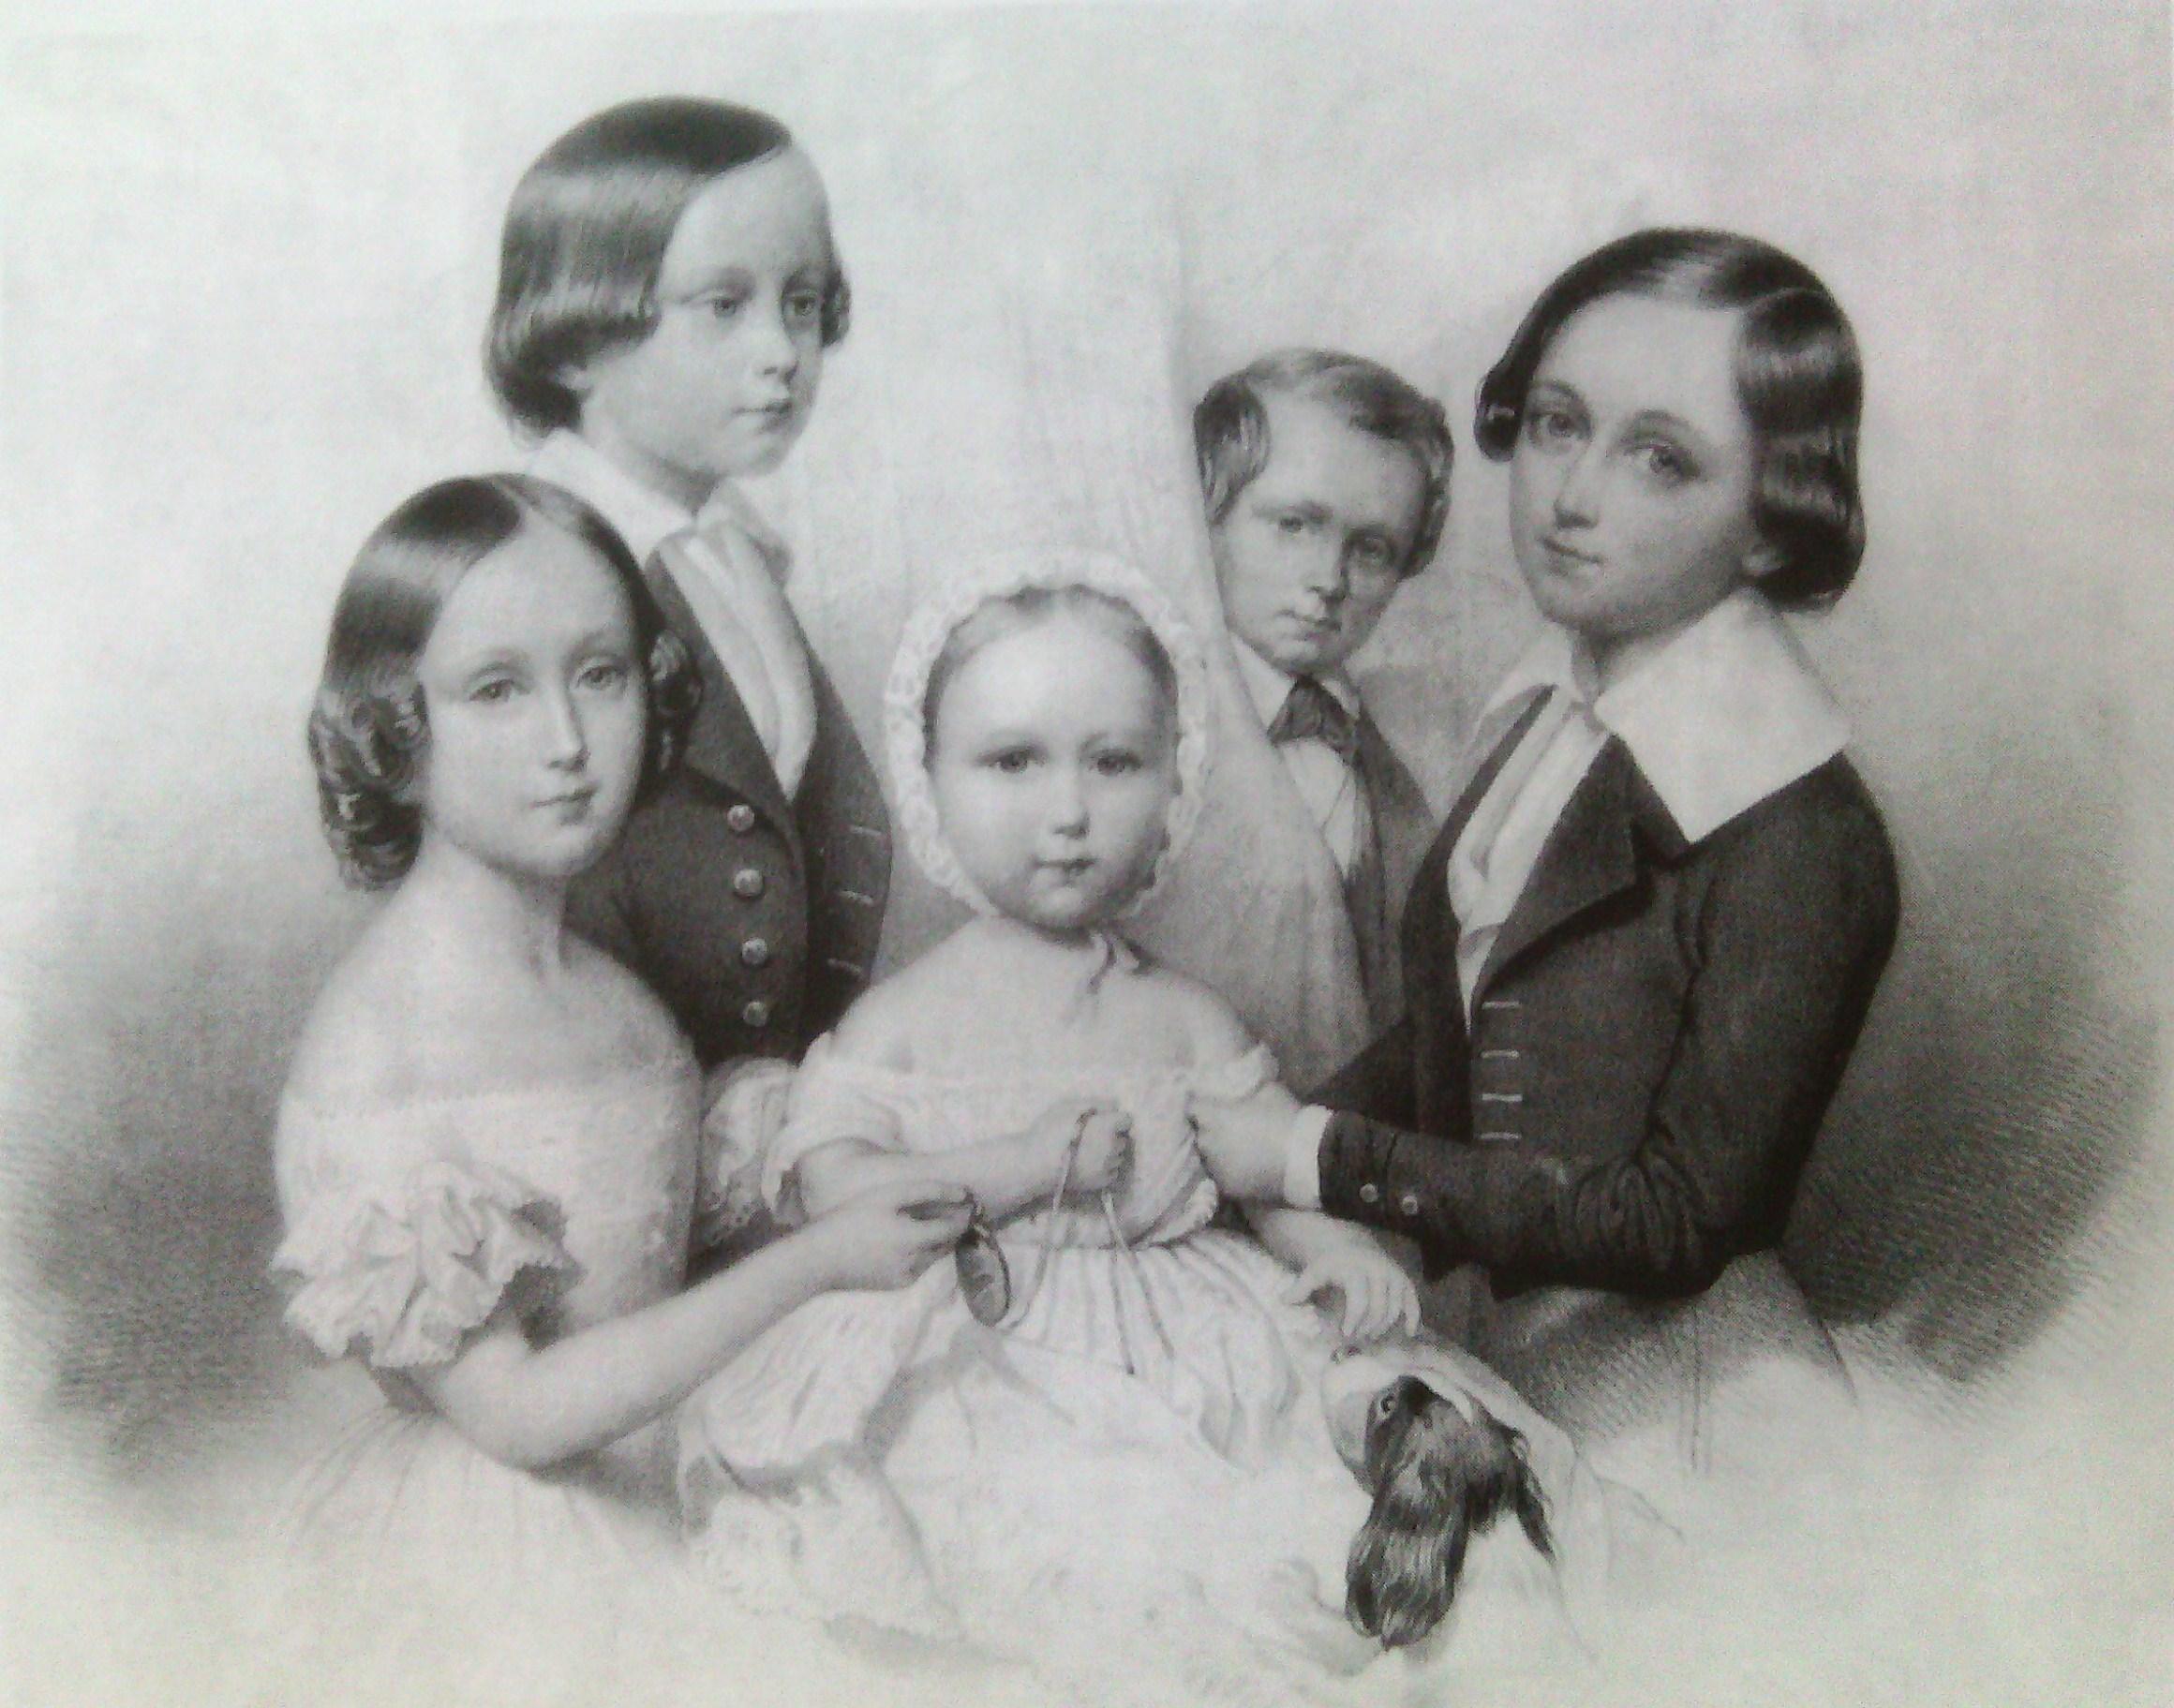 https://upload.wikimedia.org/wikipedia/commons/0/04/Family_Zubov.jpg